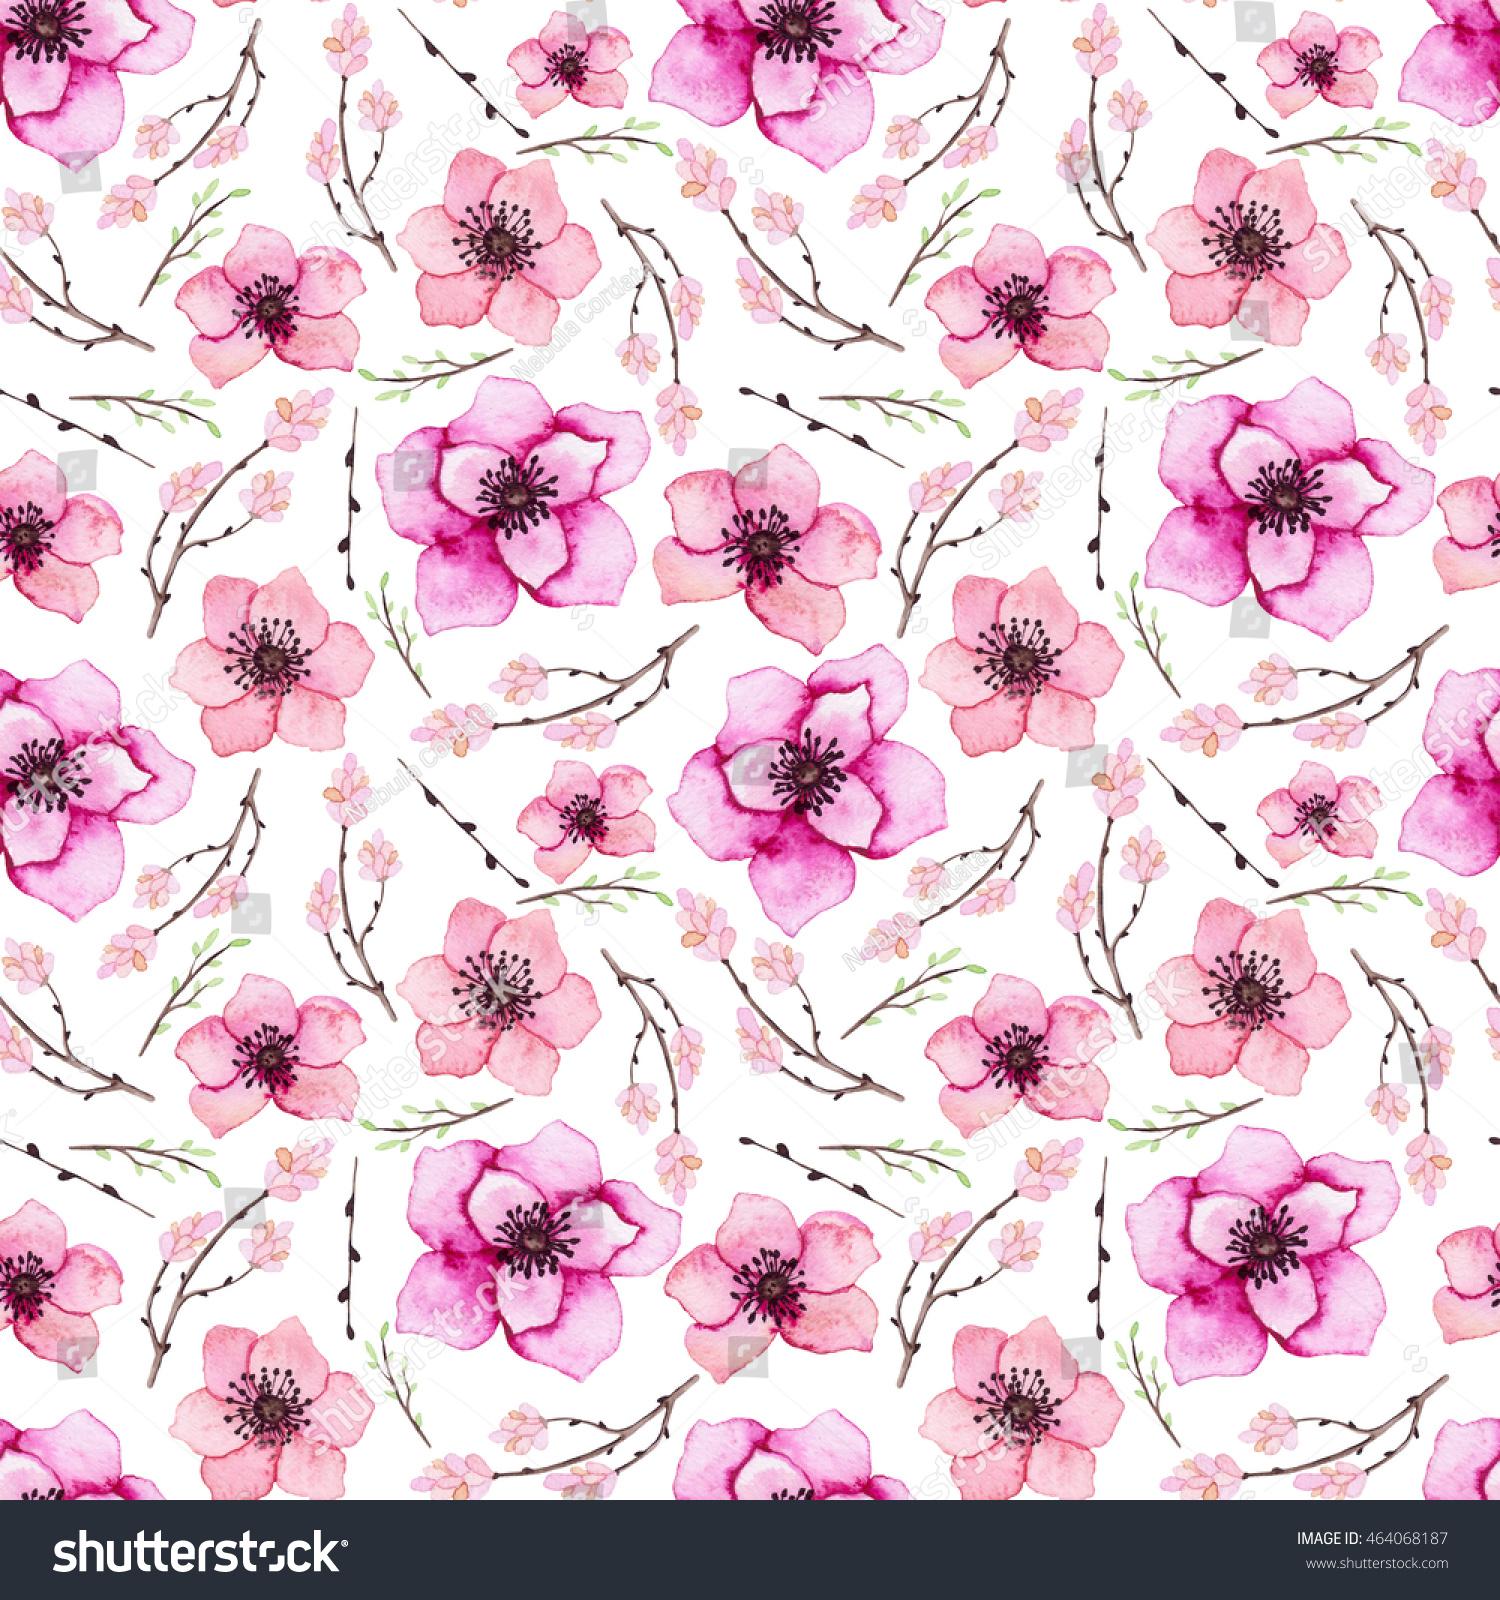 Watercolor Tropical Pink Flowers Seamless Texture Ez Canvas